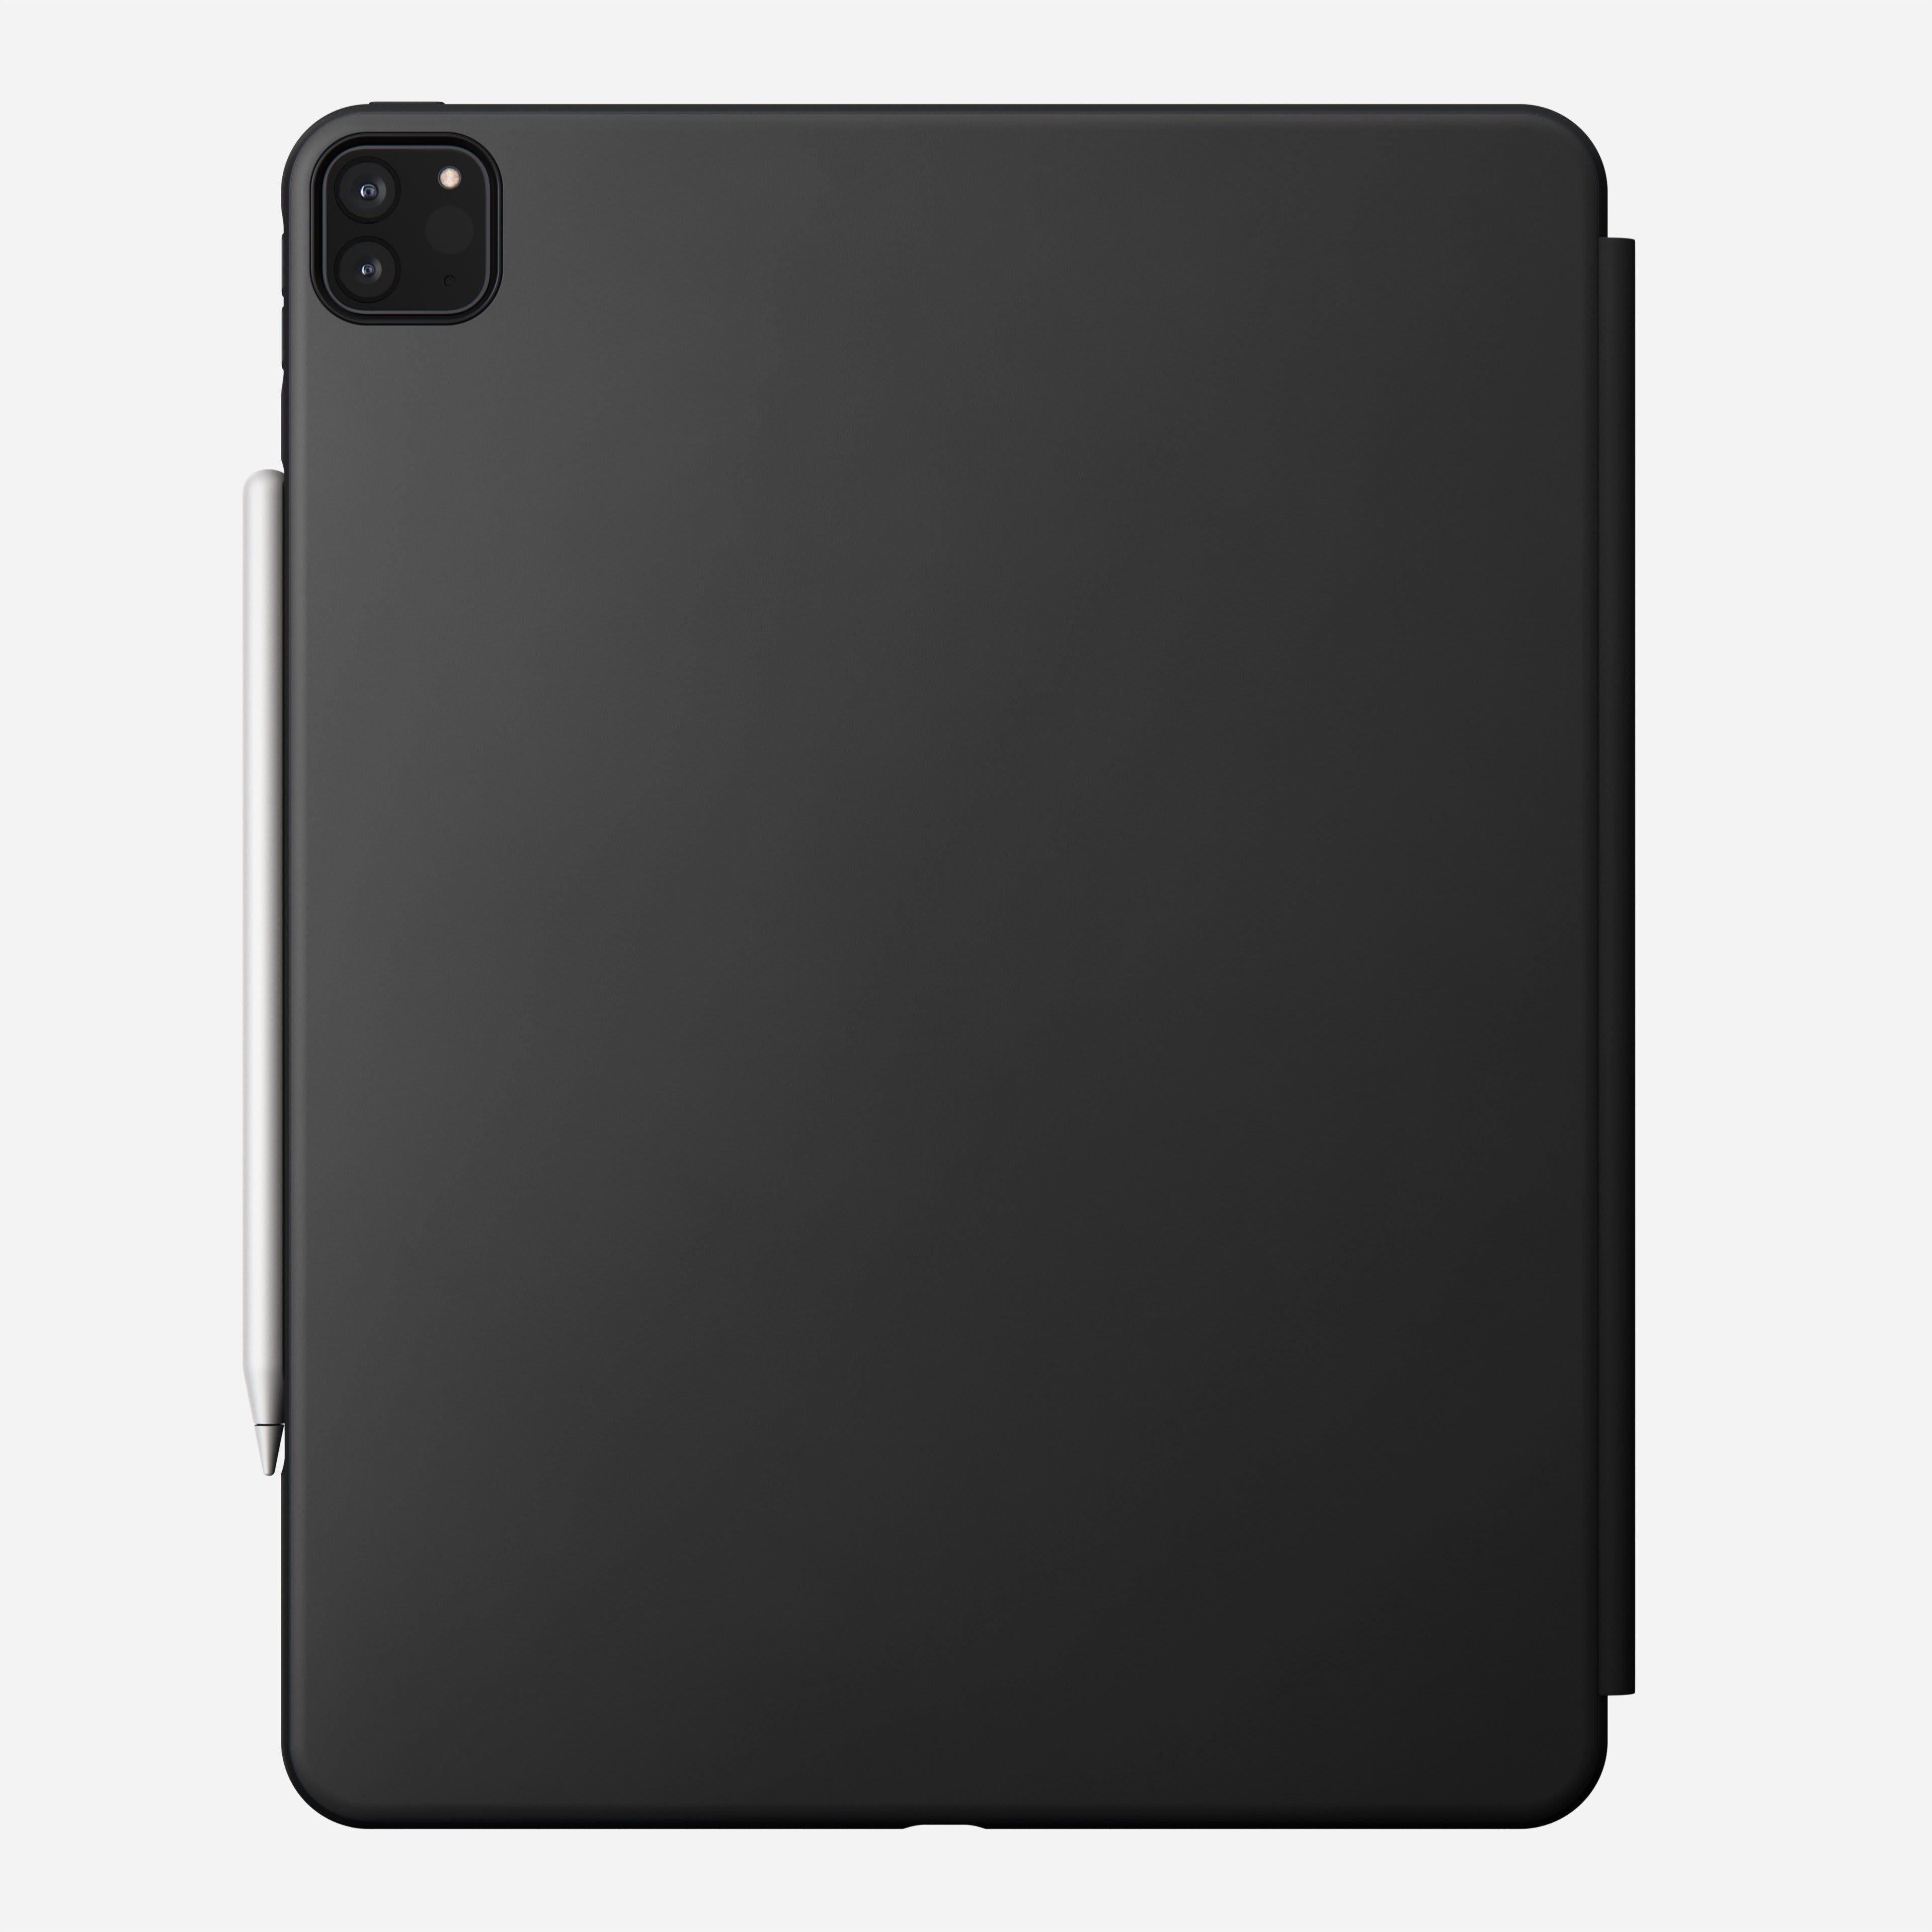 Rugged folio pu deep gray ipad pro 12 9 inch 4th generation